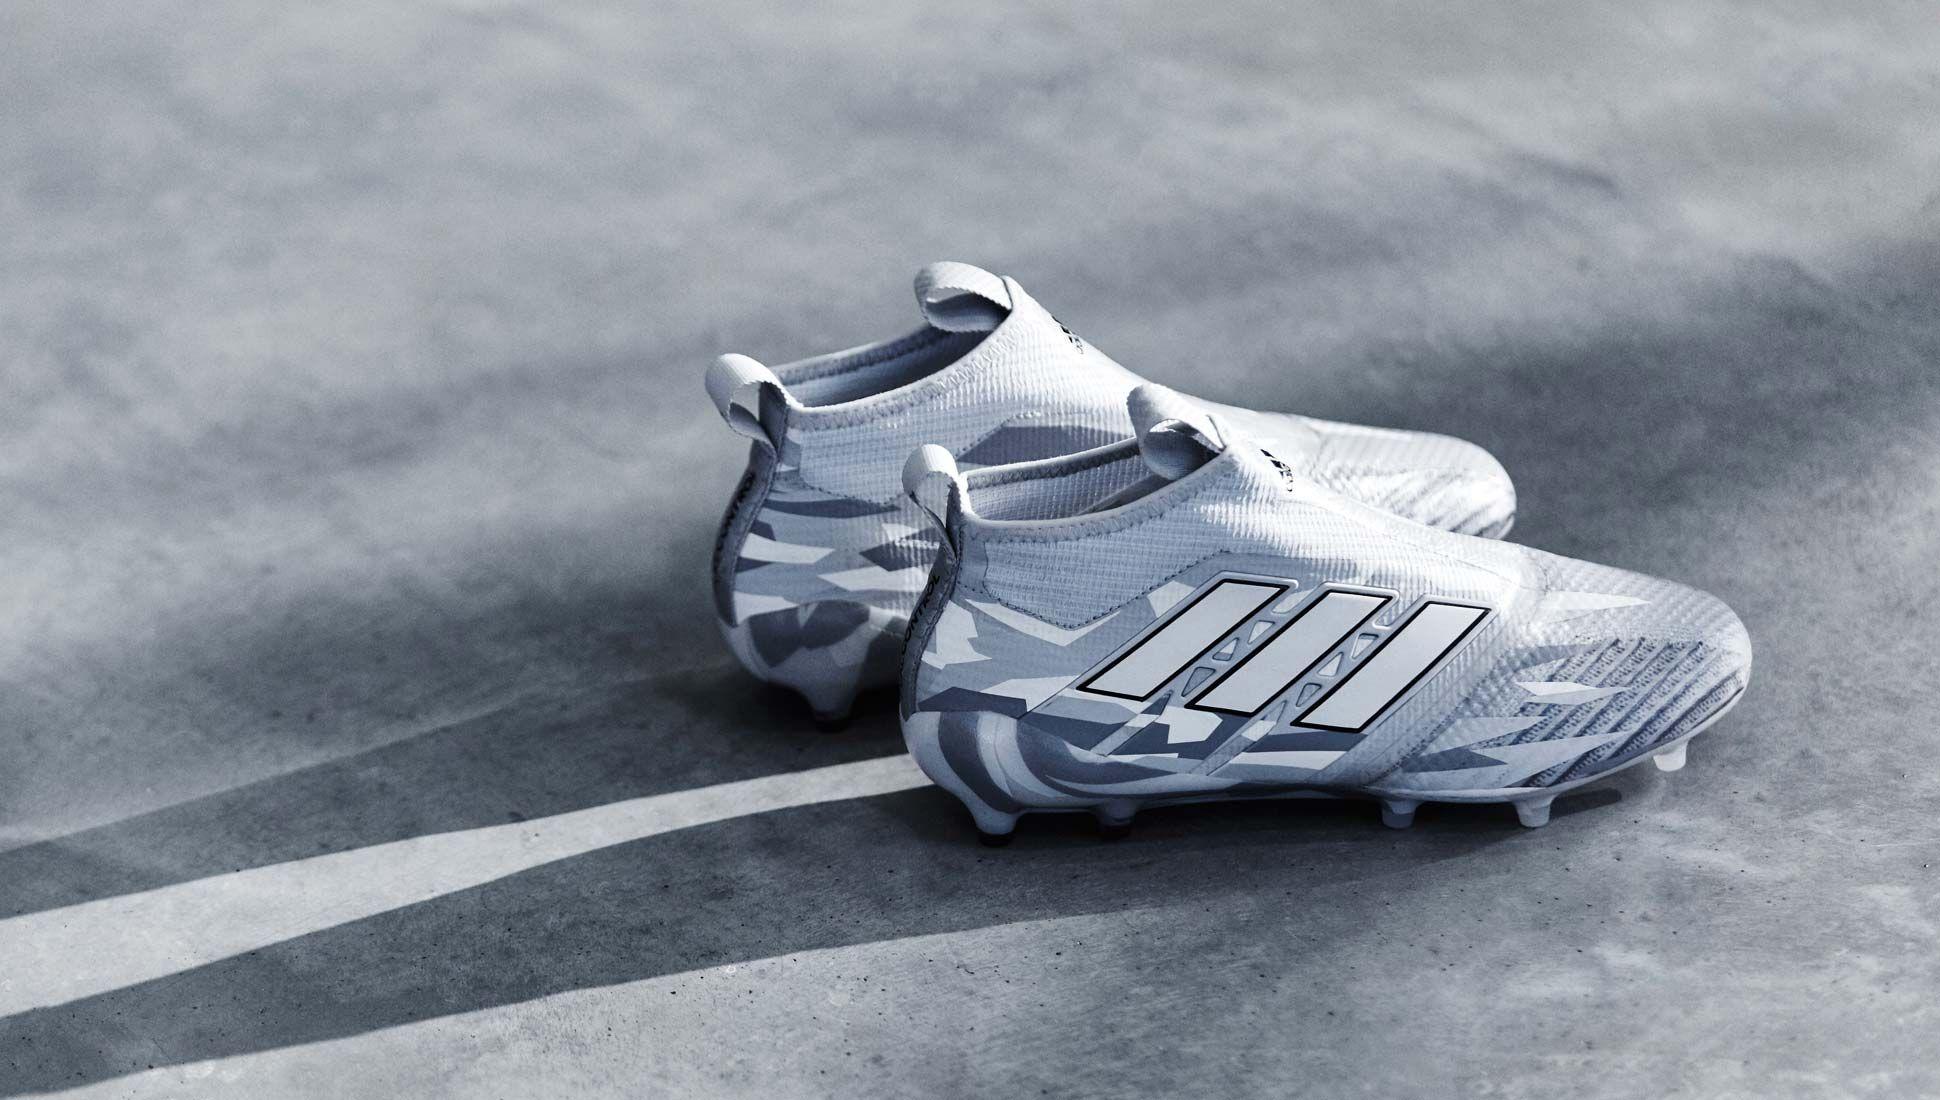 Adidas Ace 17 Purecontrol Grey Camo Football Boots Football Shoes Adidas